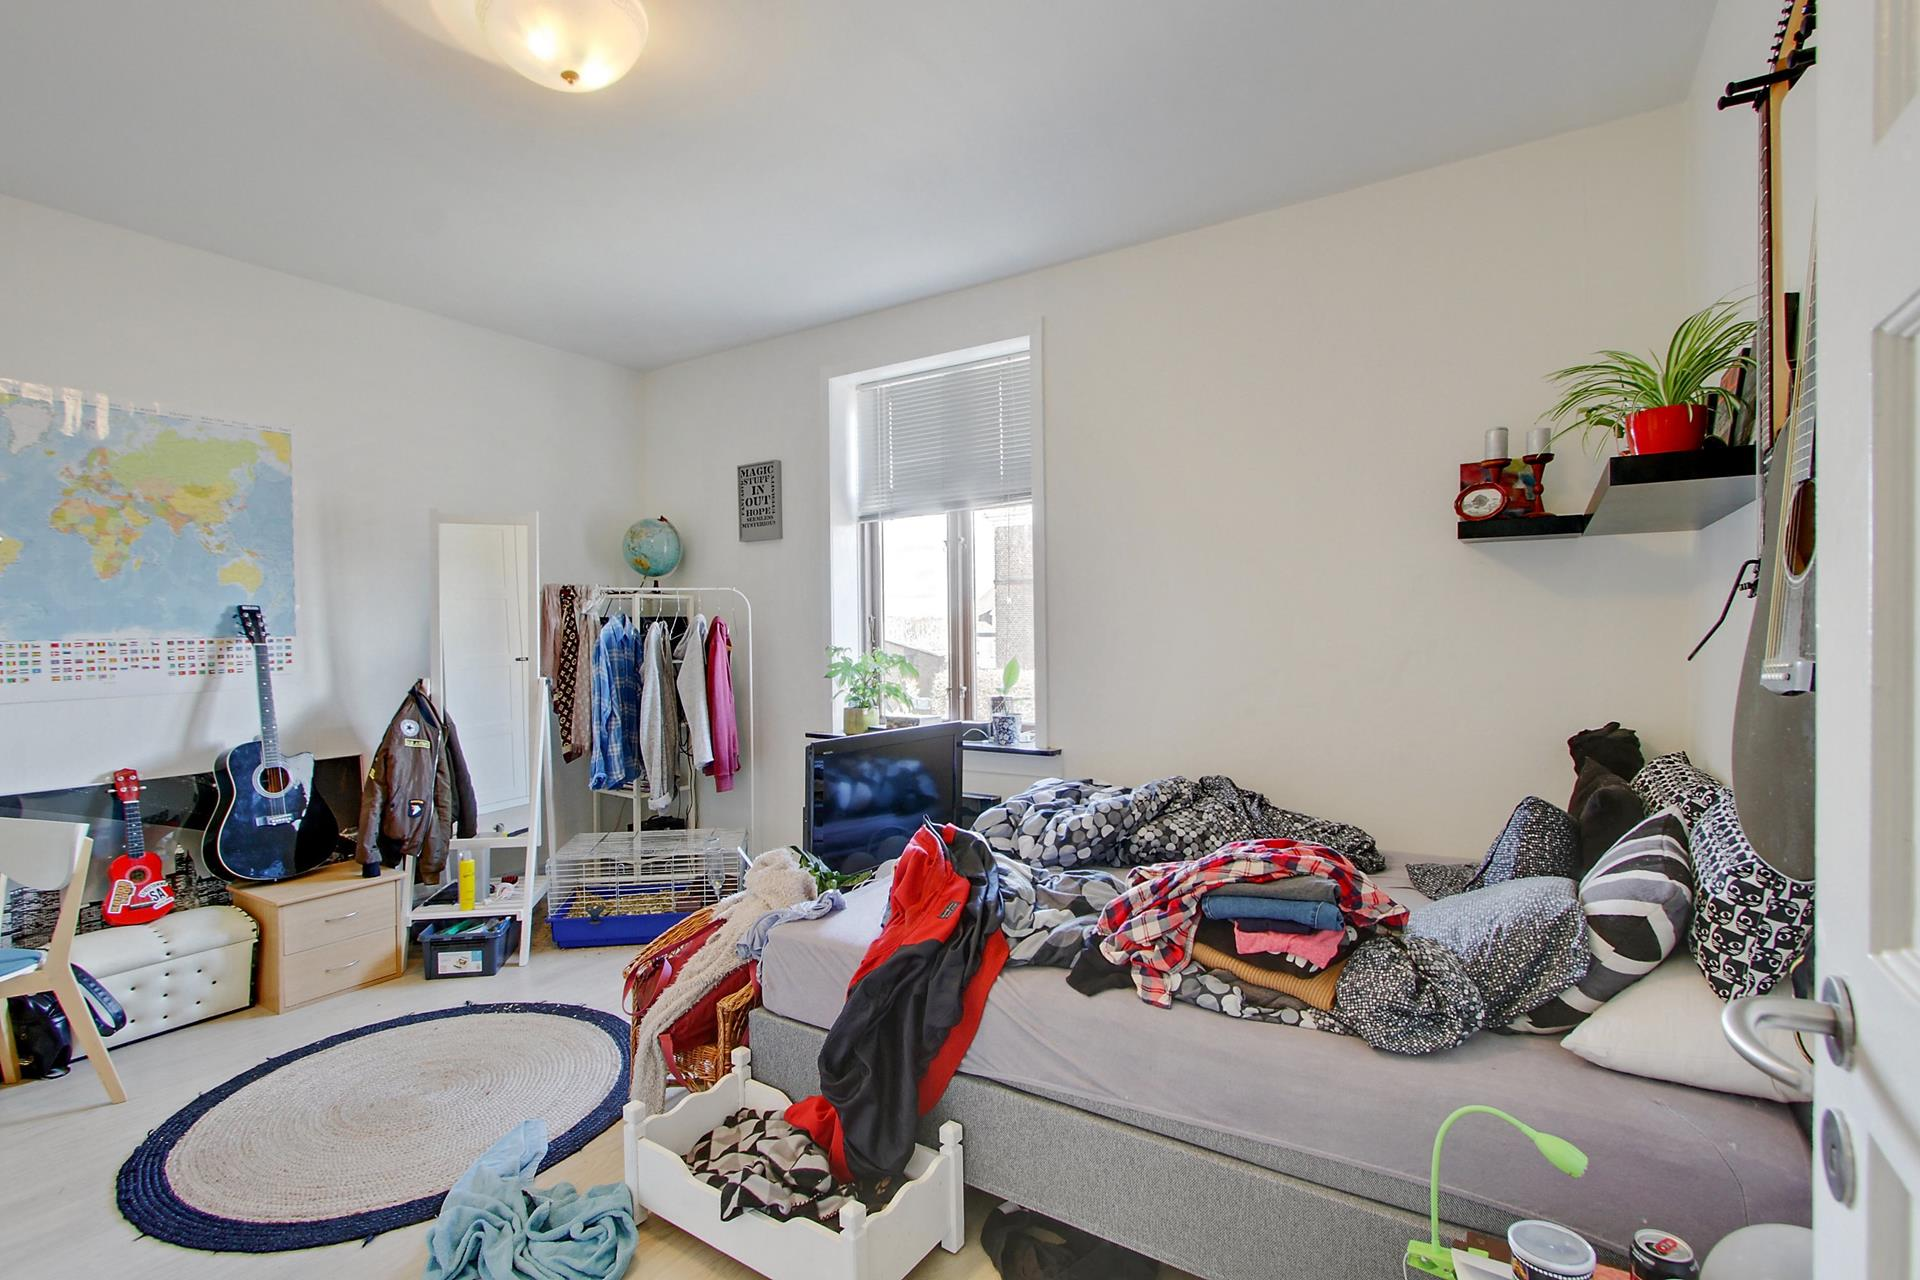 Bolig/erhverv på Tyge Brahes Vej i Aalborg - Soveværelse